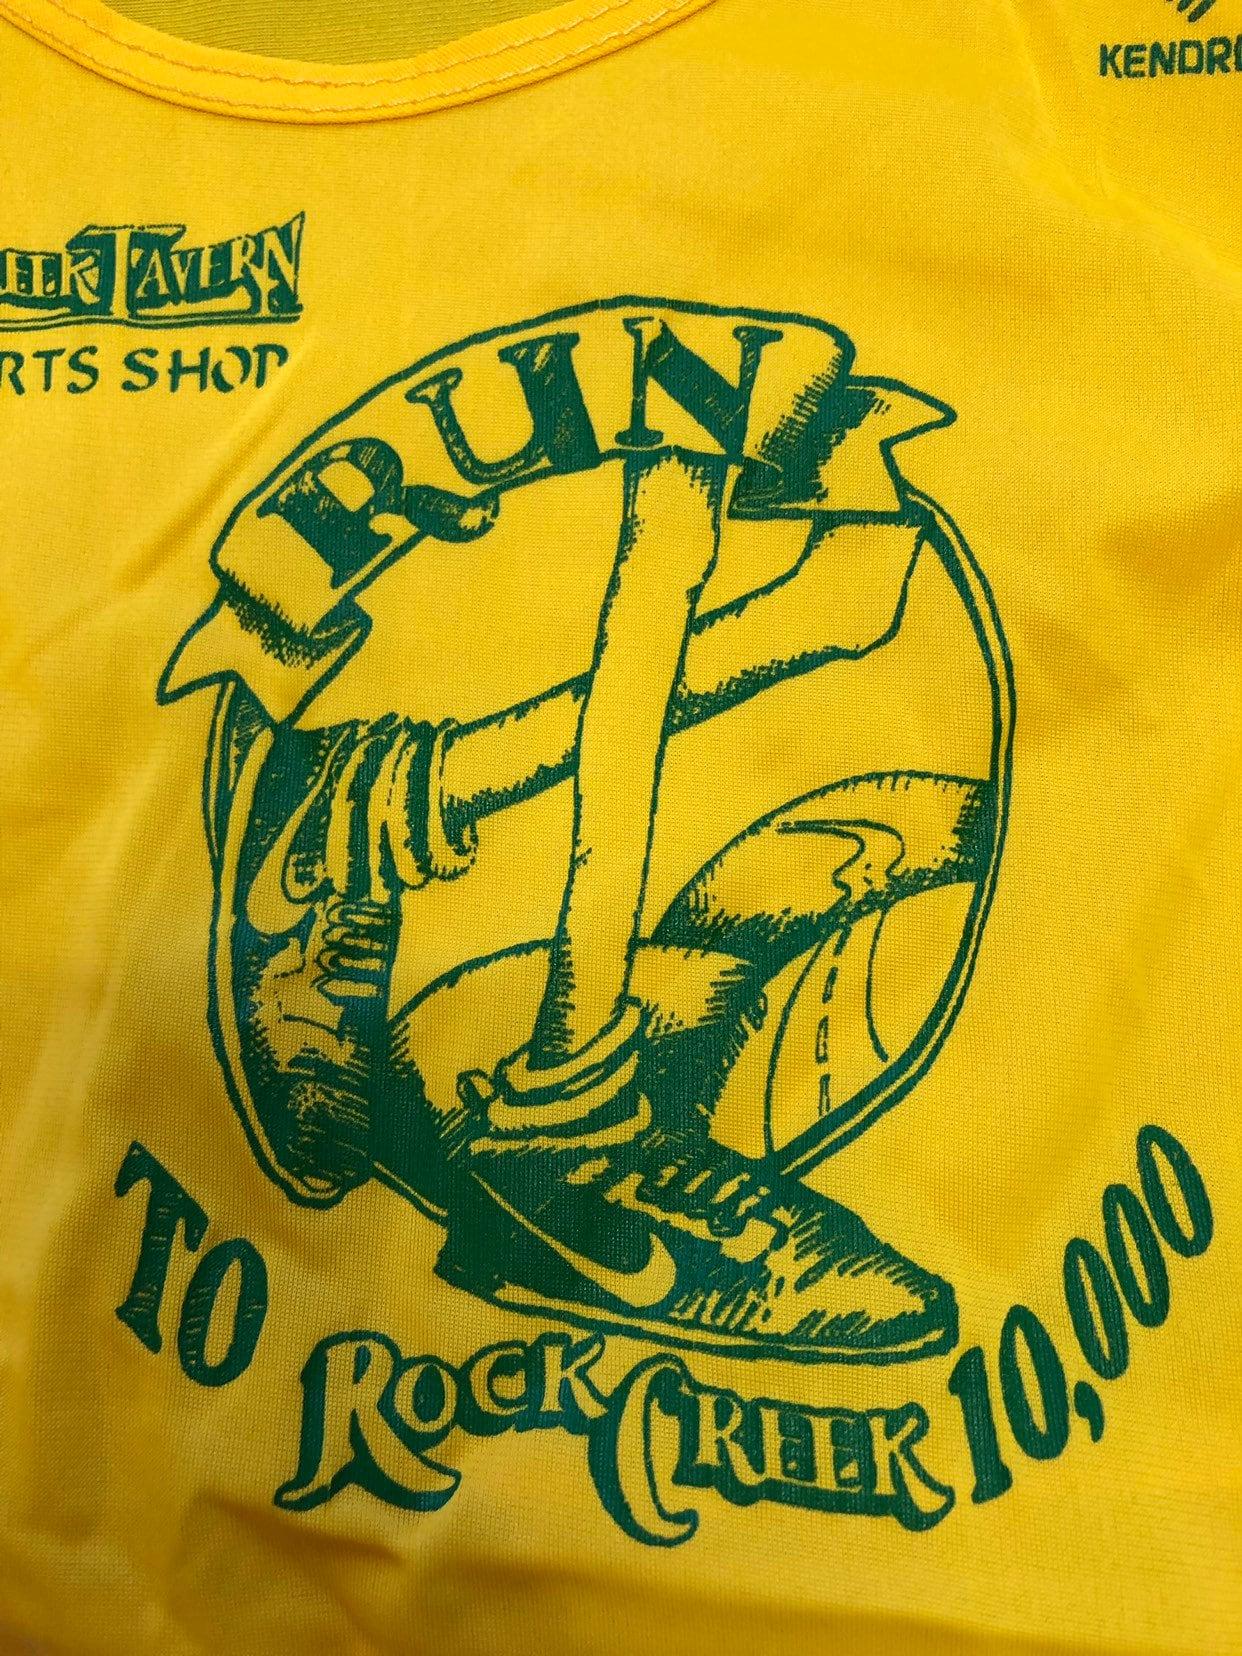 Nike Jersey Vintage 80s Race Racing Mesh Mesh Mesh Nylon Zapatillas Swoosh Run Rock Creek Shirt tamaño Large 2eec9c